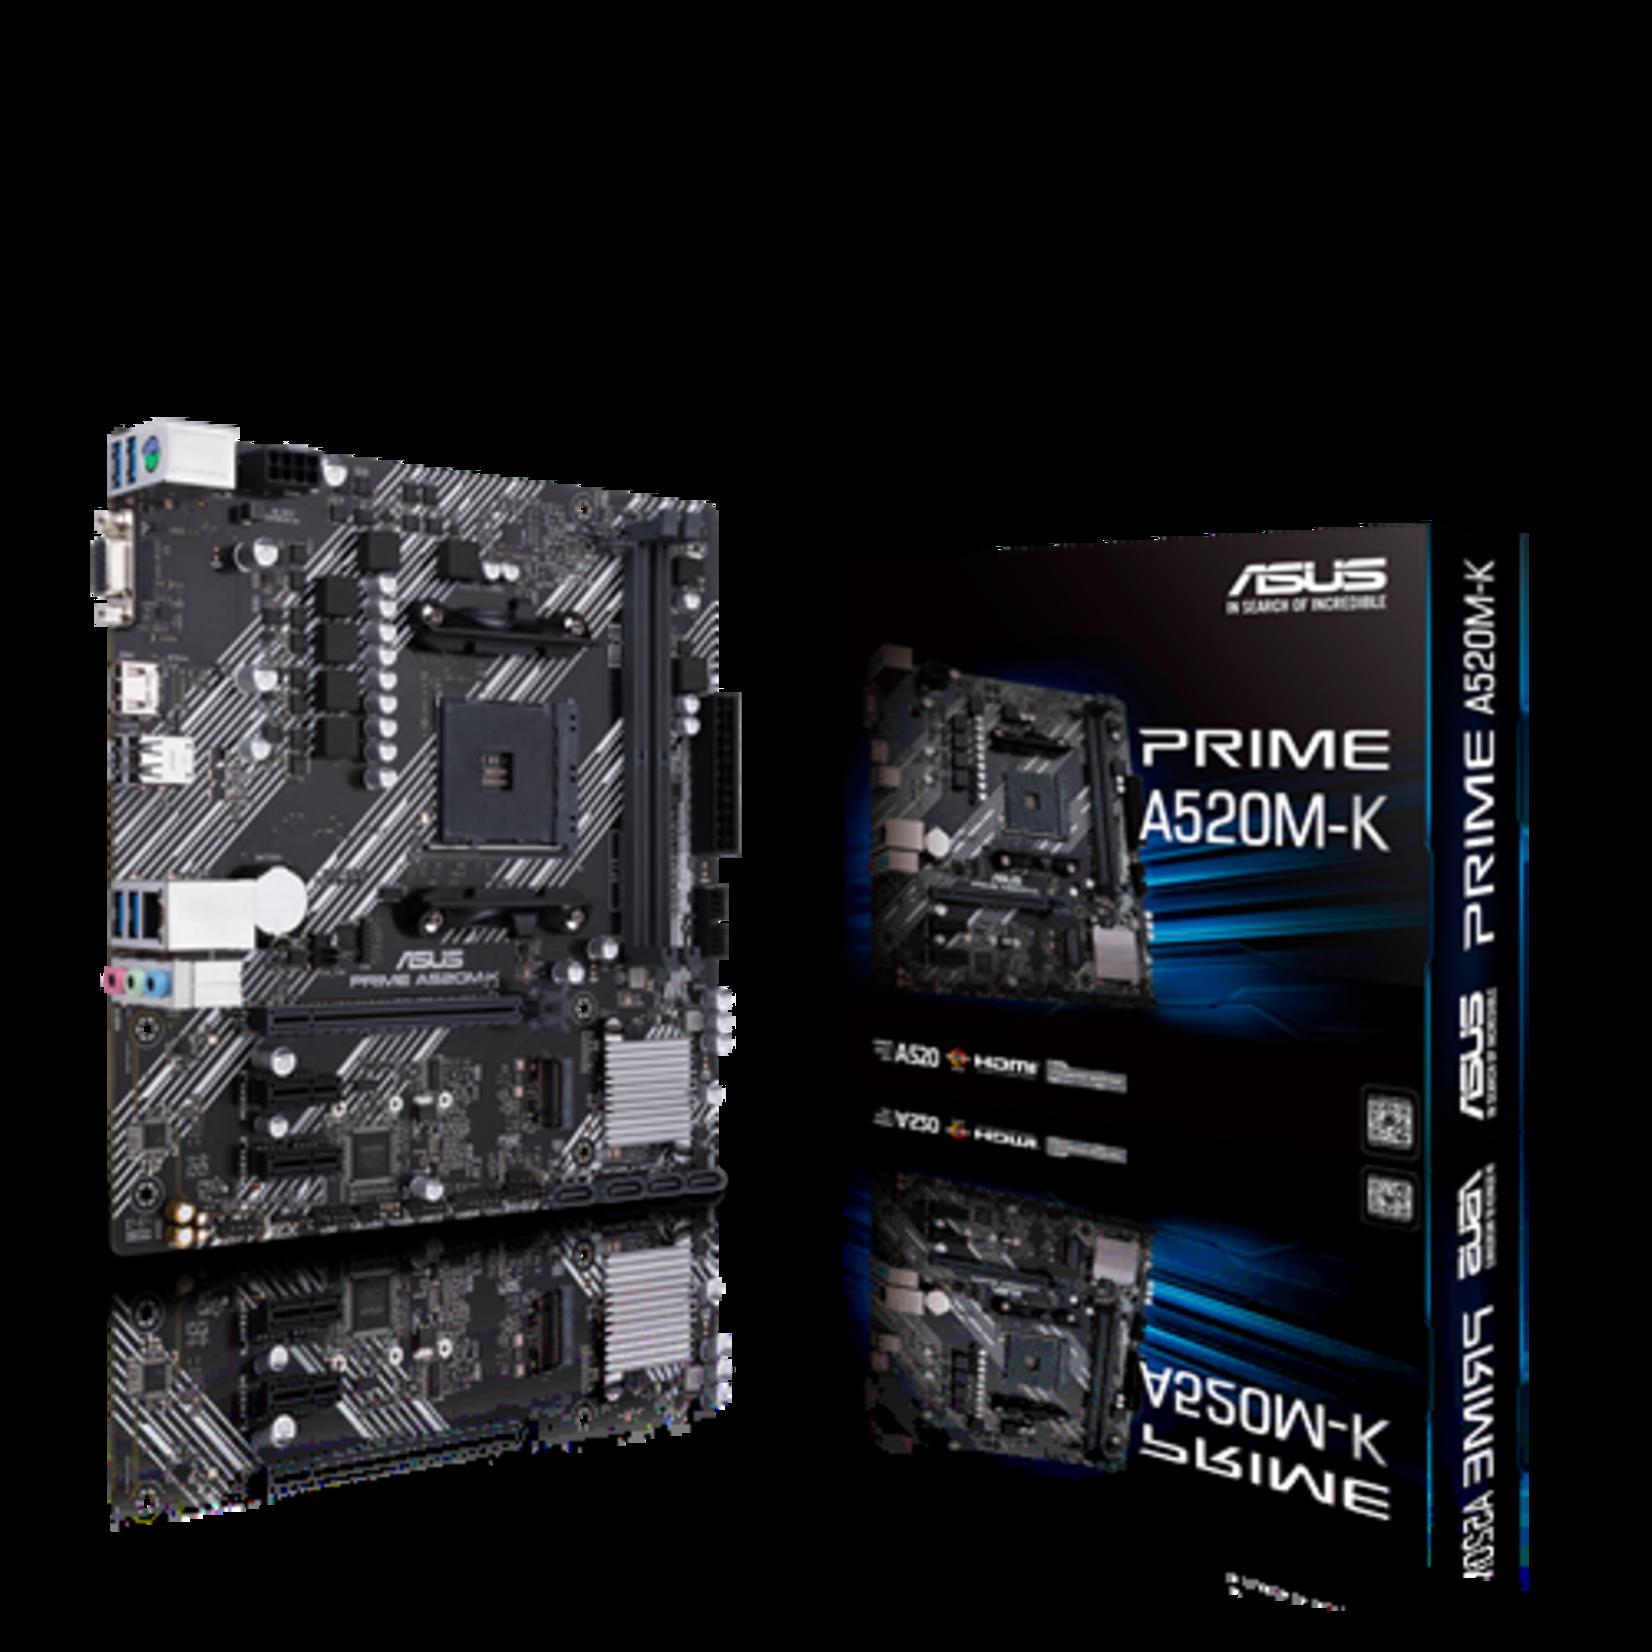 Asus A520M-K Prime Motherboard